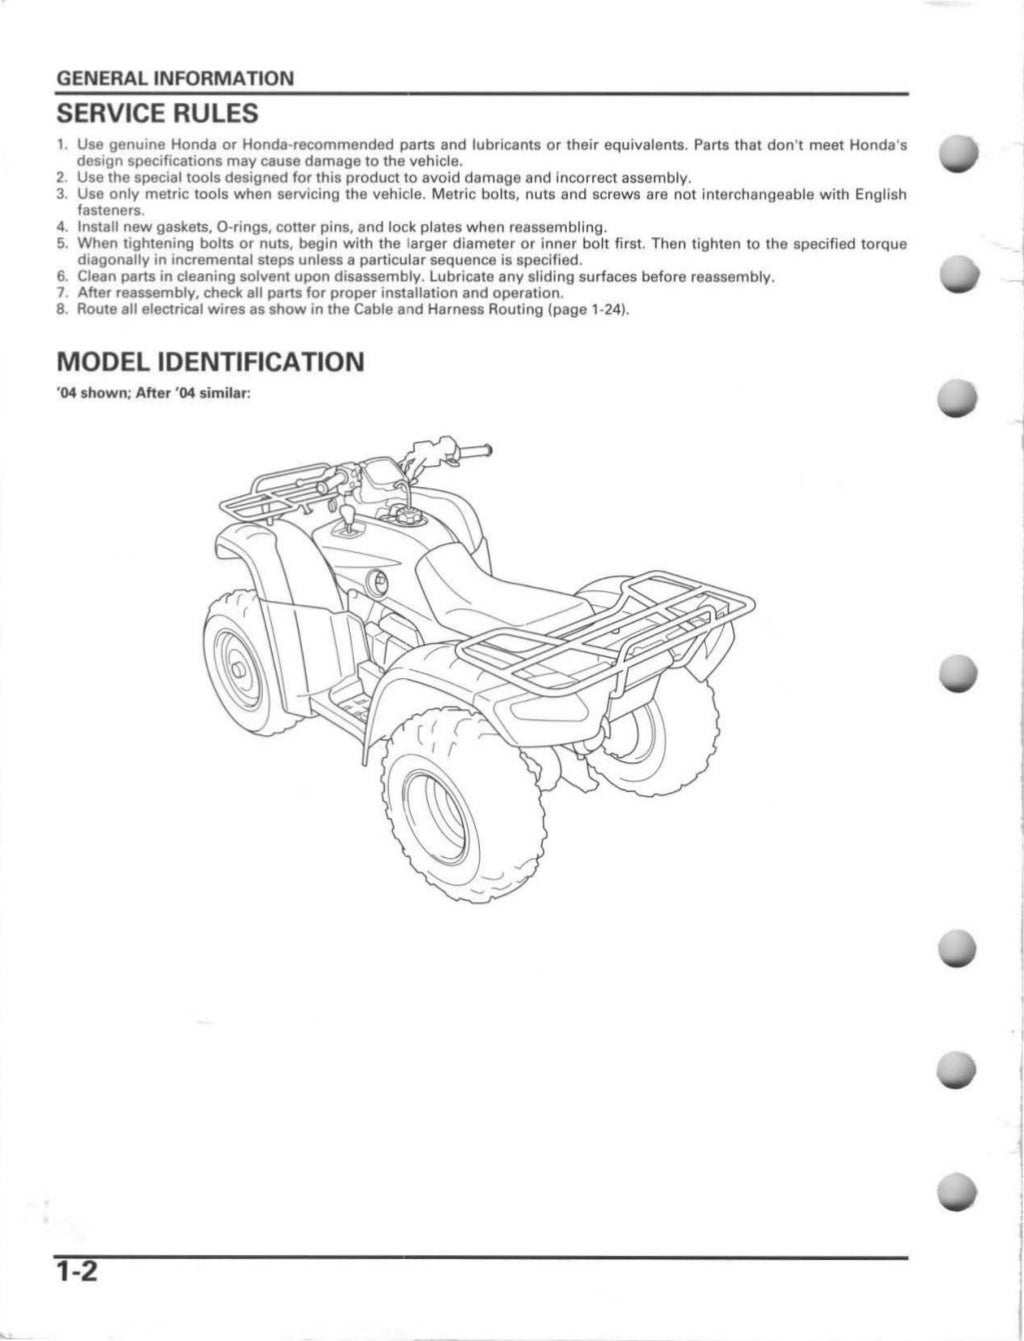 2004 Honda TRX400FGA FourTrax Rancher AT GPScape Service